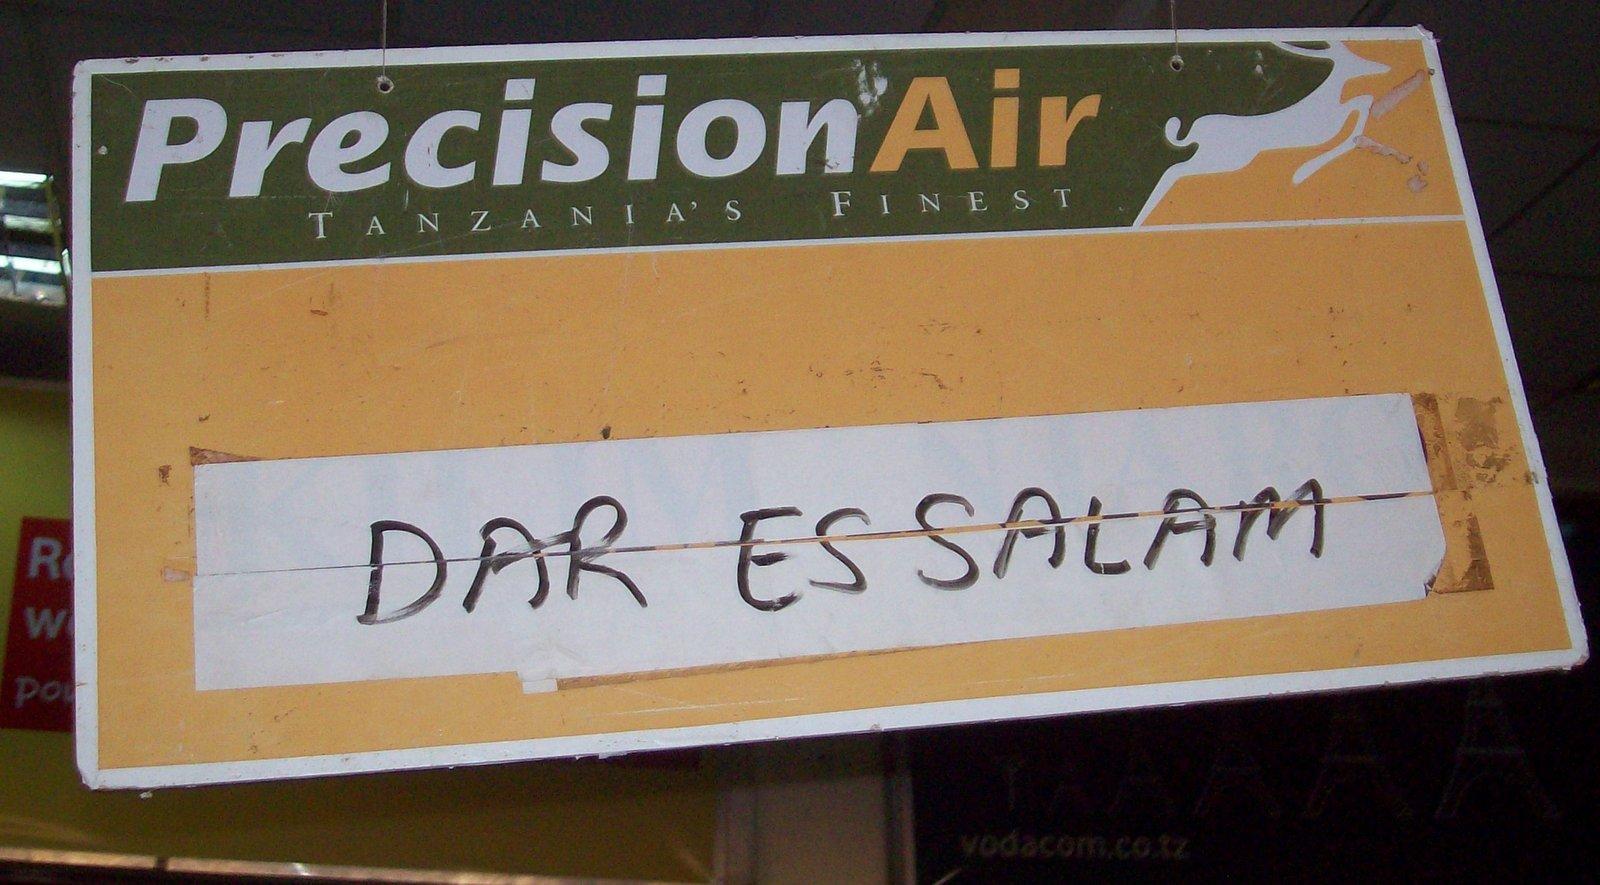 Precision Air Flugziel:Dar-es-Salam